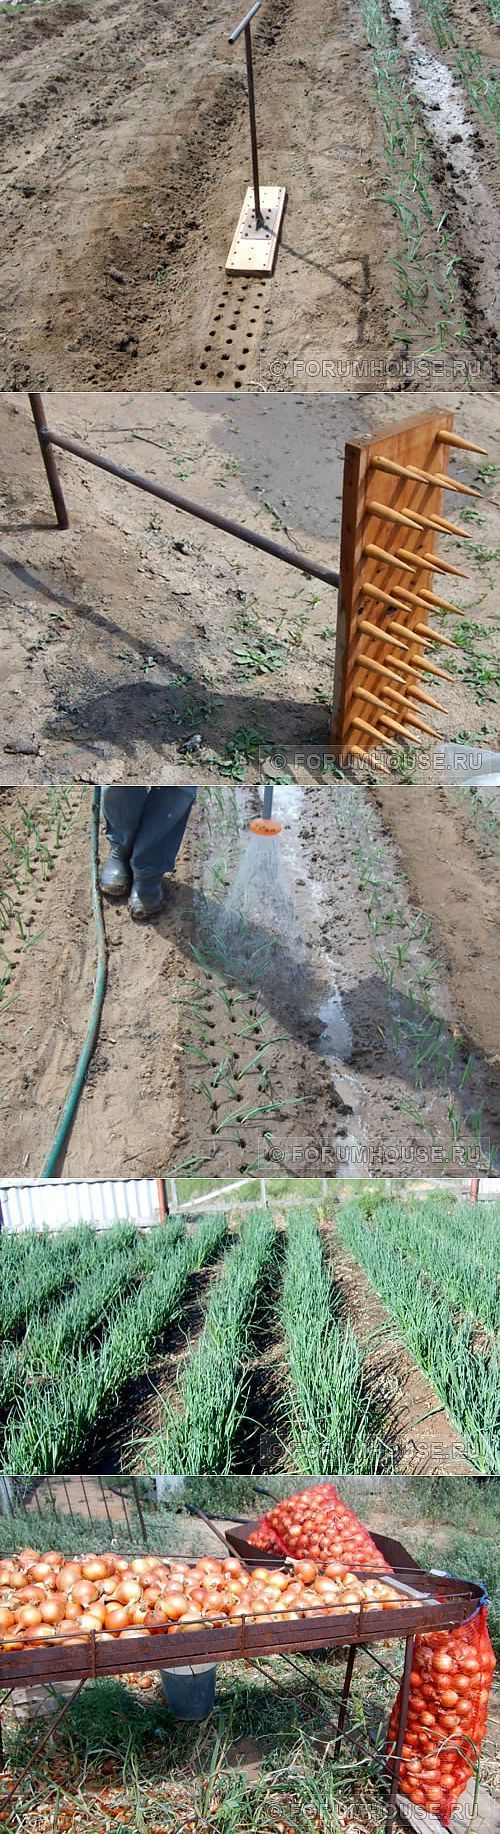 Cresciamo cipolle |  tenuta di campagna #gardeningtools